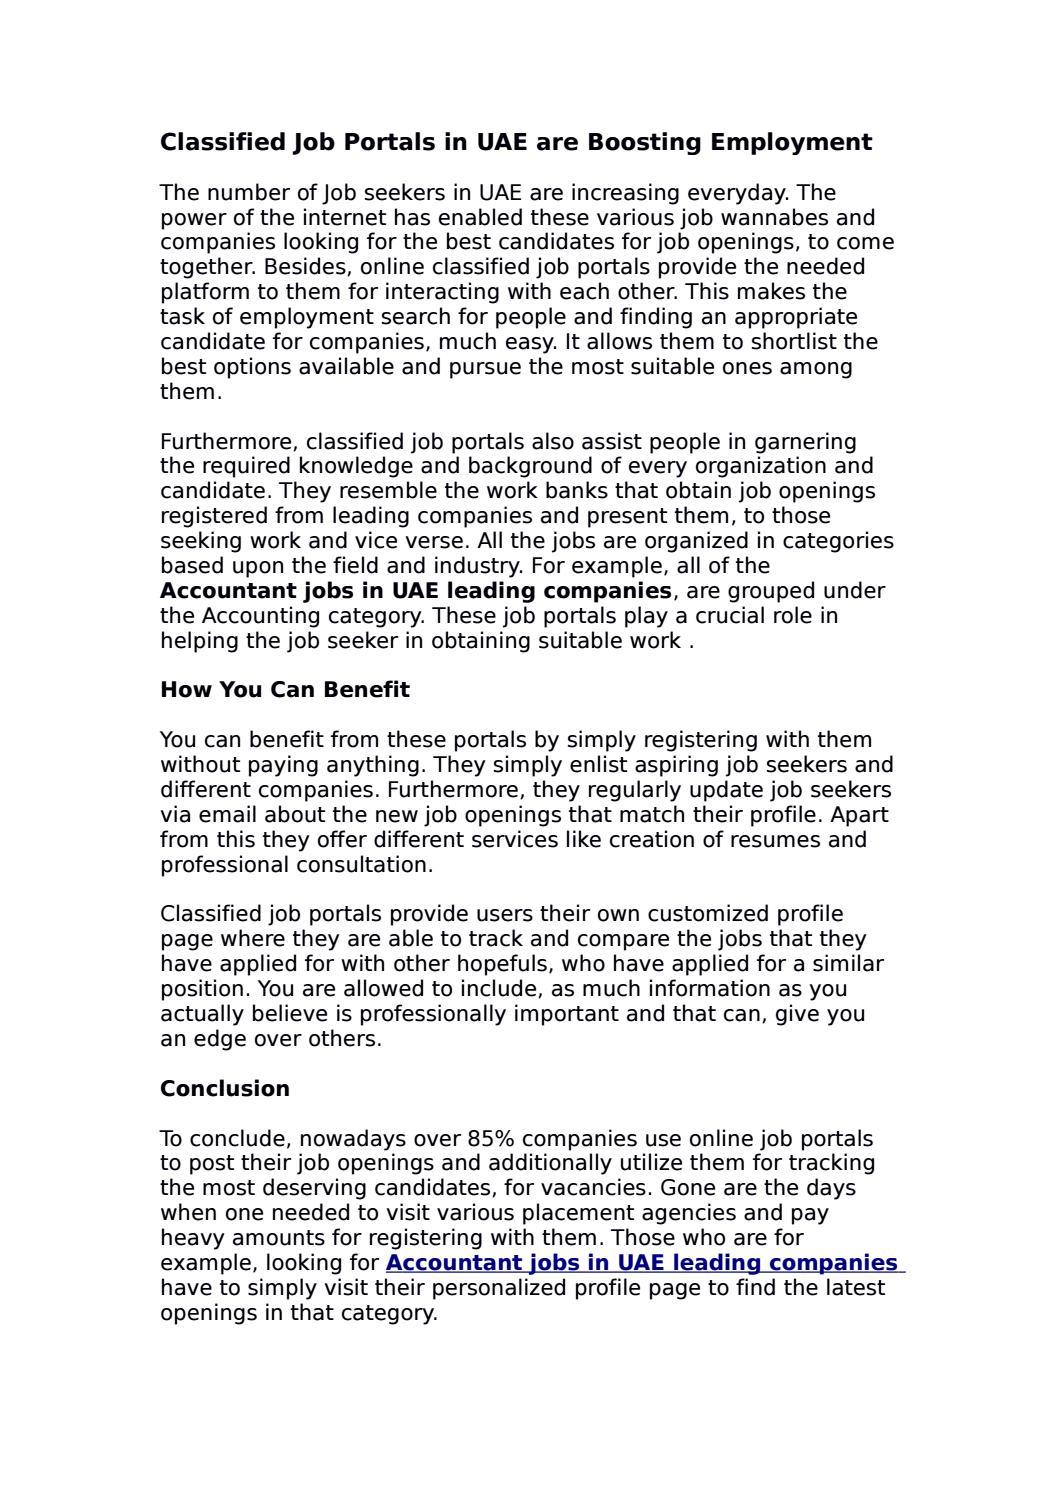 accountant jobs in uae leading companies by classify issuu